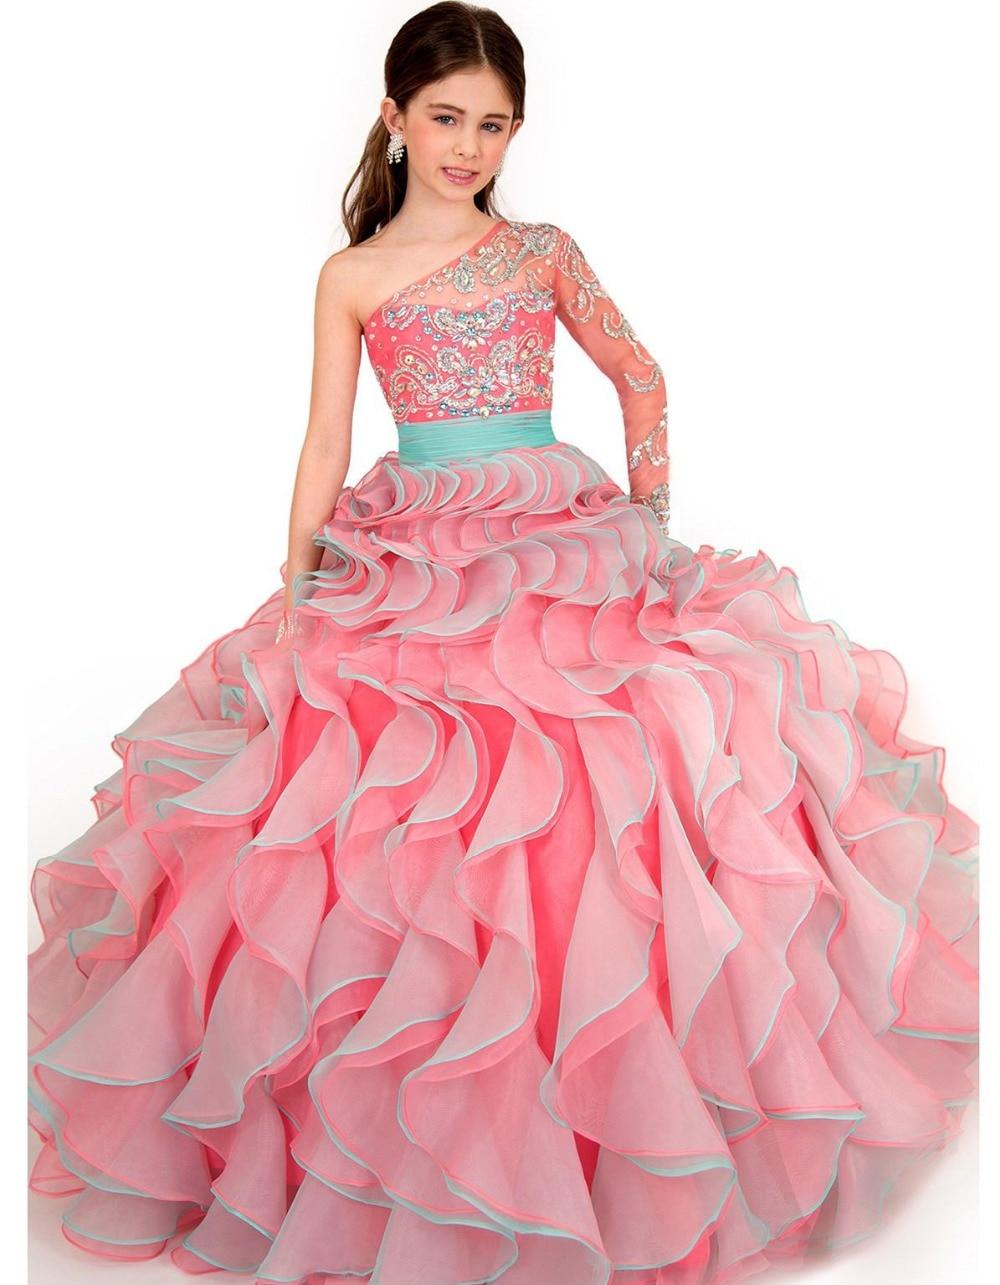 Encantador Vestido De Novia Aqua Ideas Ornamento Elaboración ...